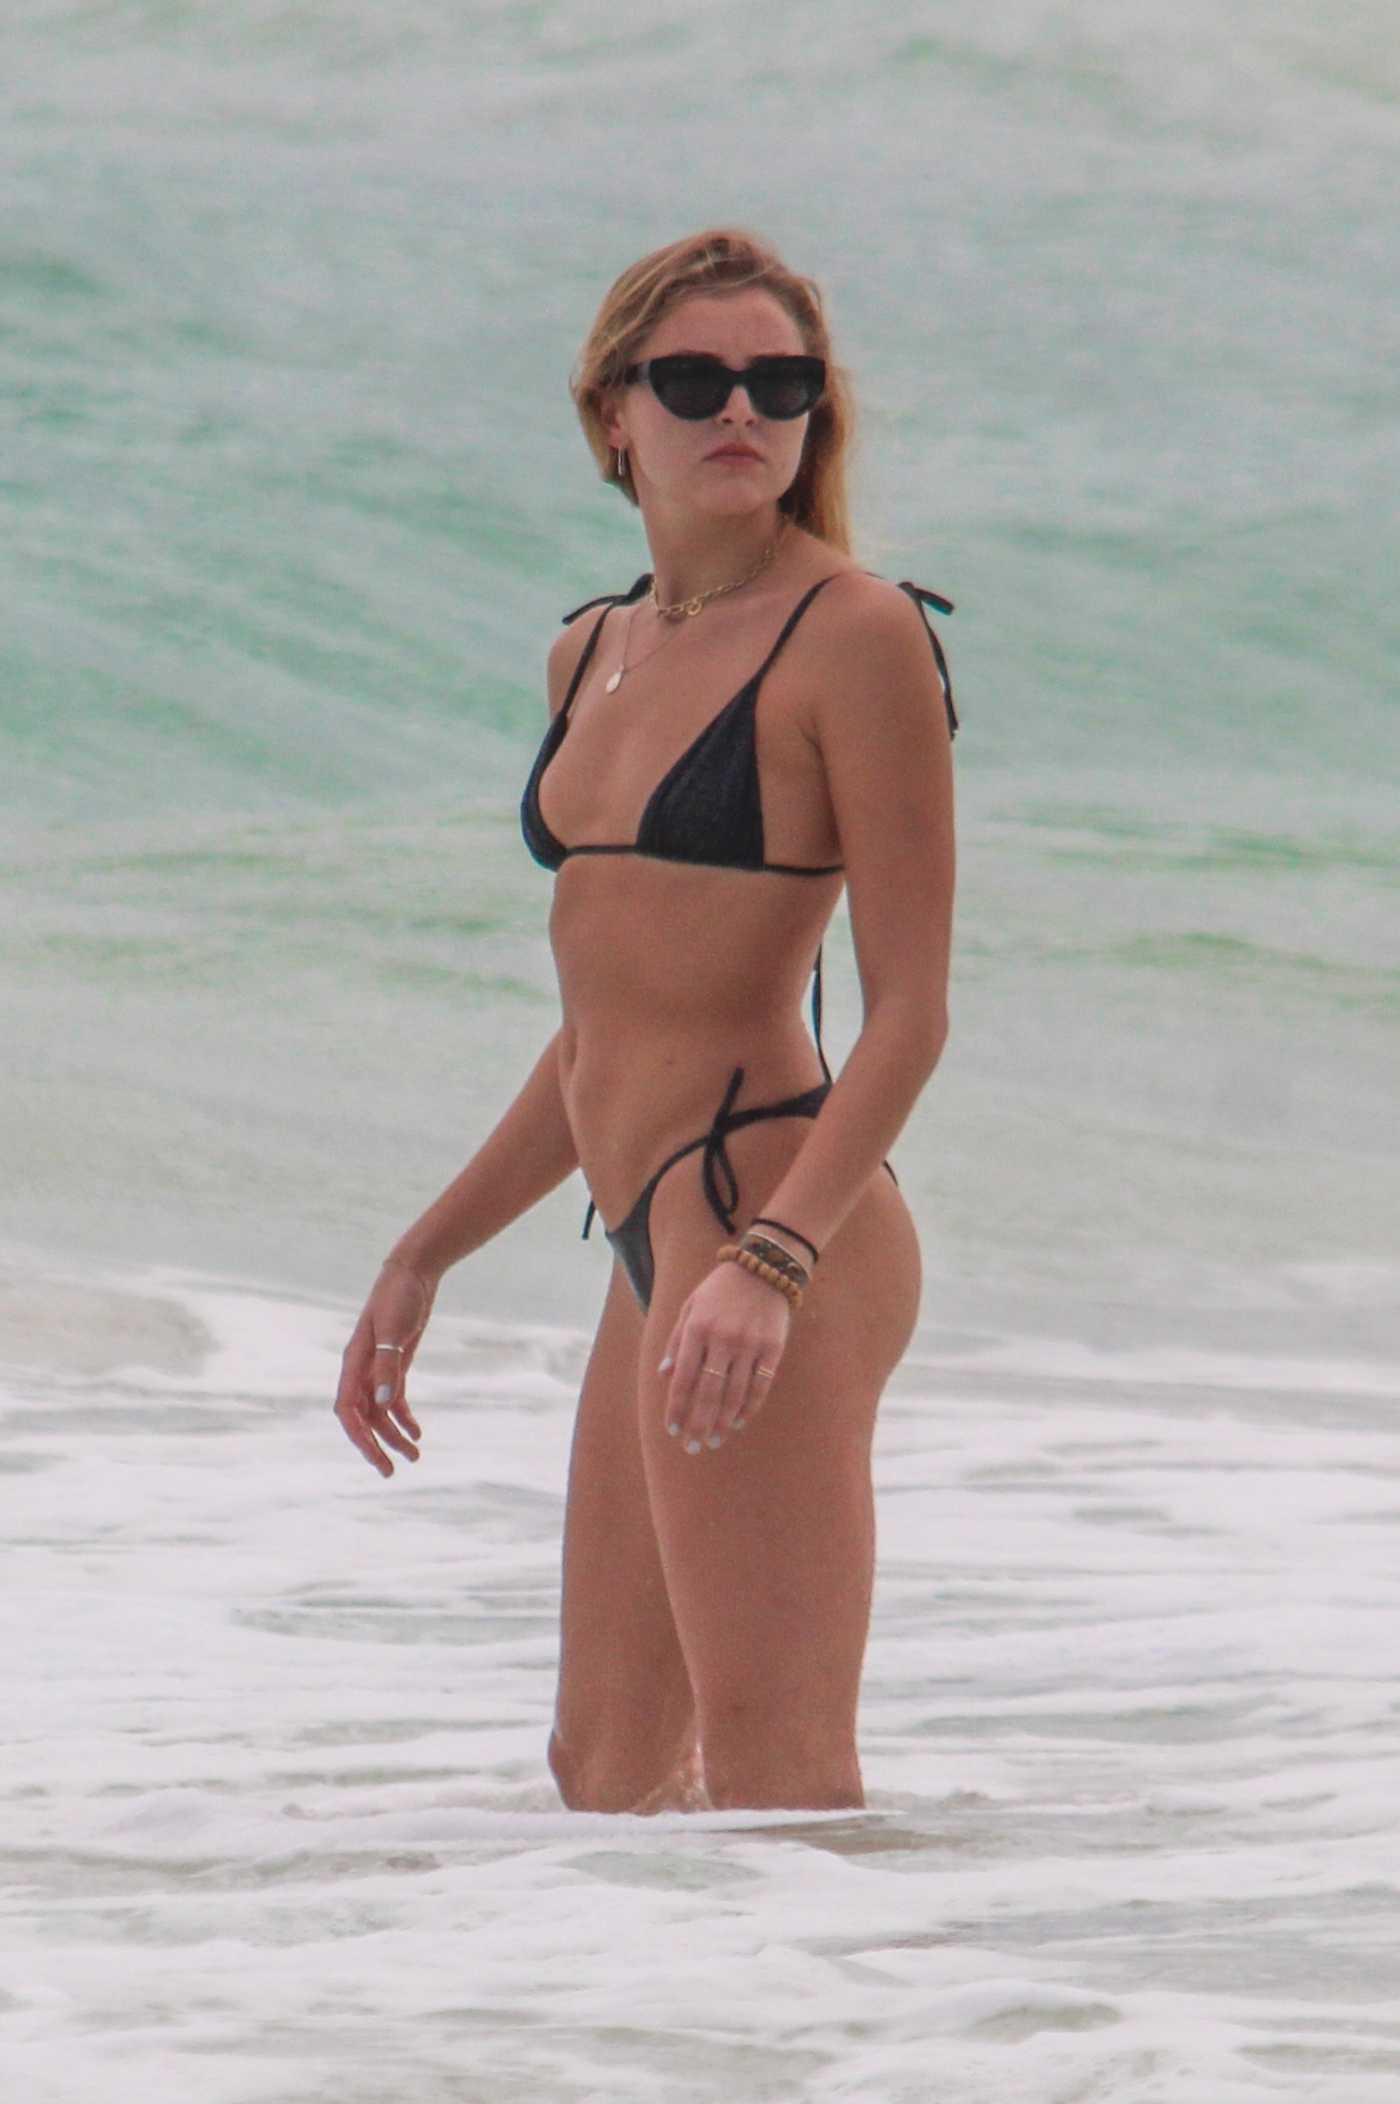 Rachel Hilbert in a Black Bikini on the Beach in Tulum, Mexico 11/27/2020